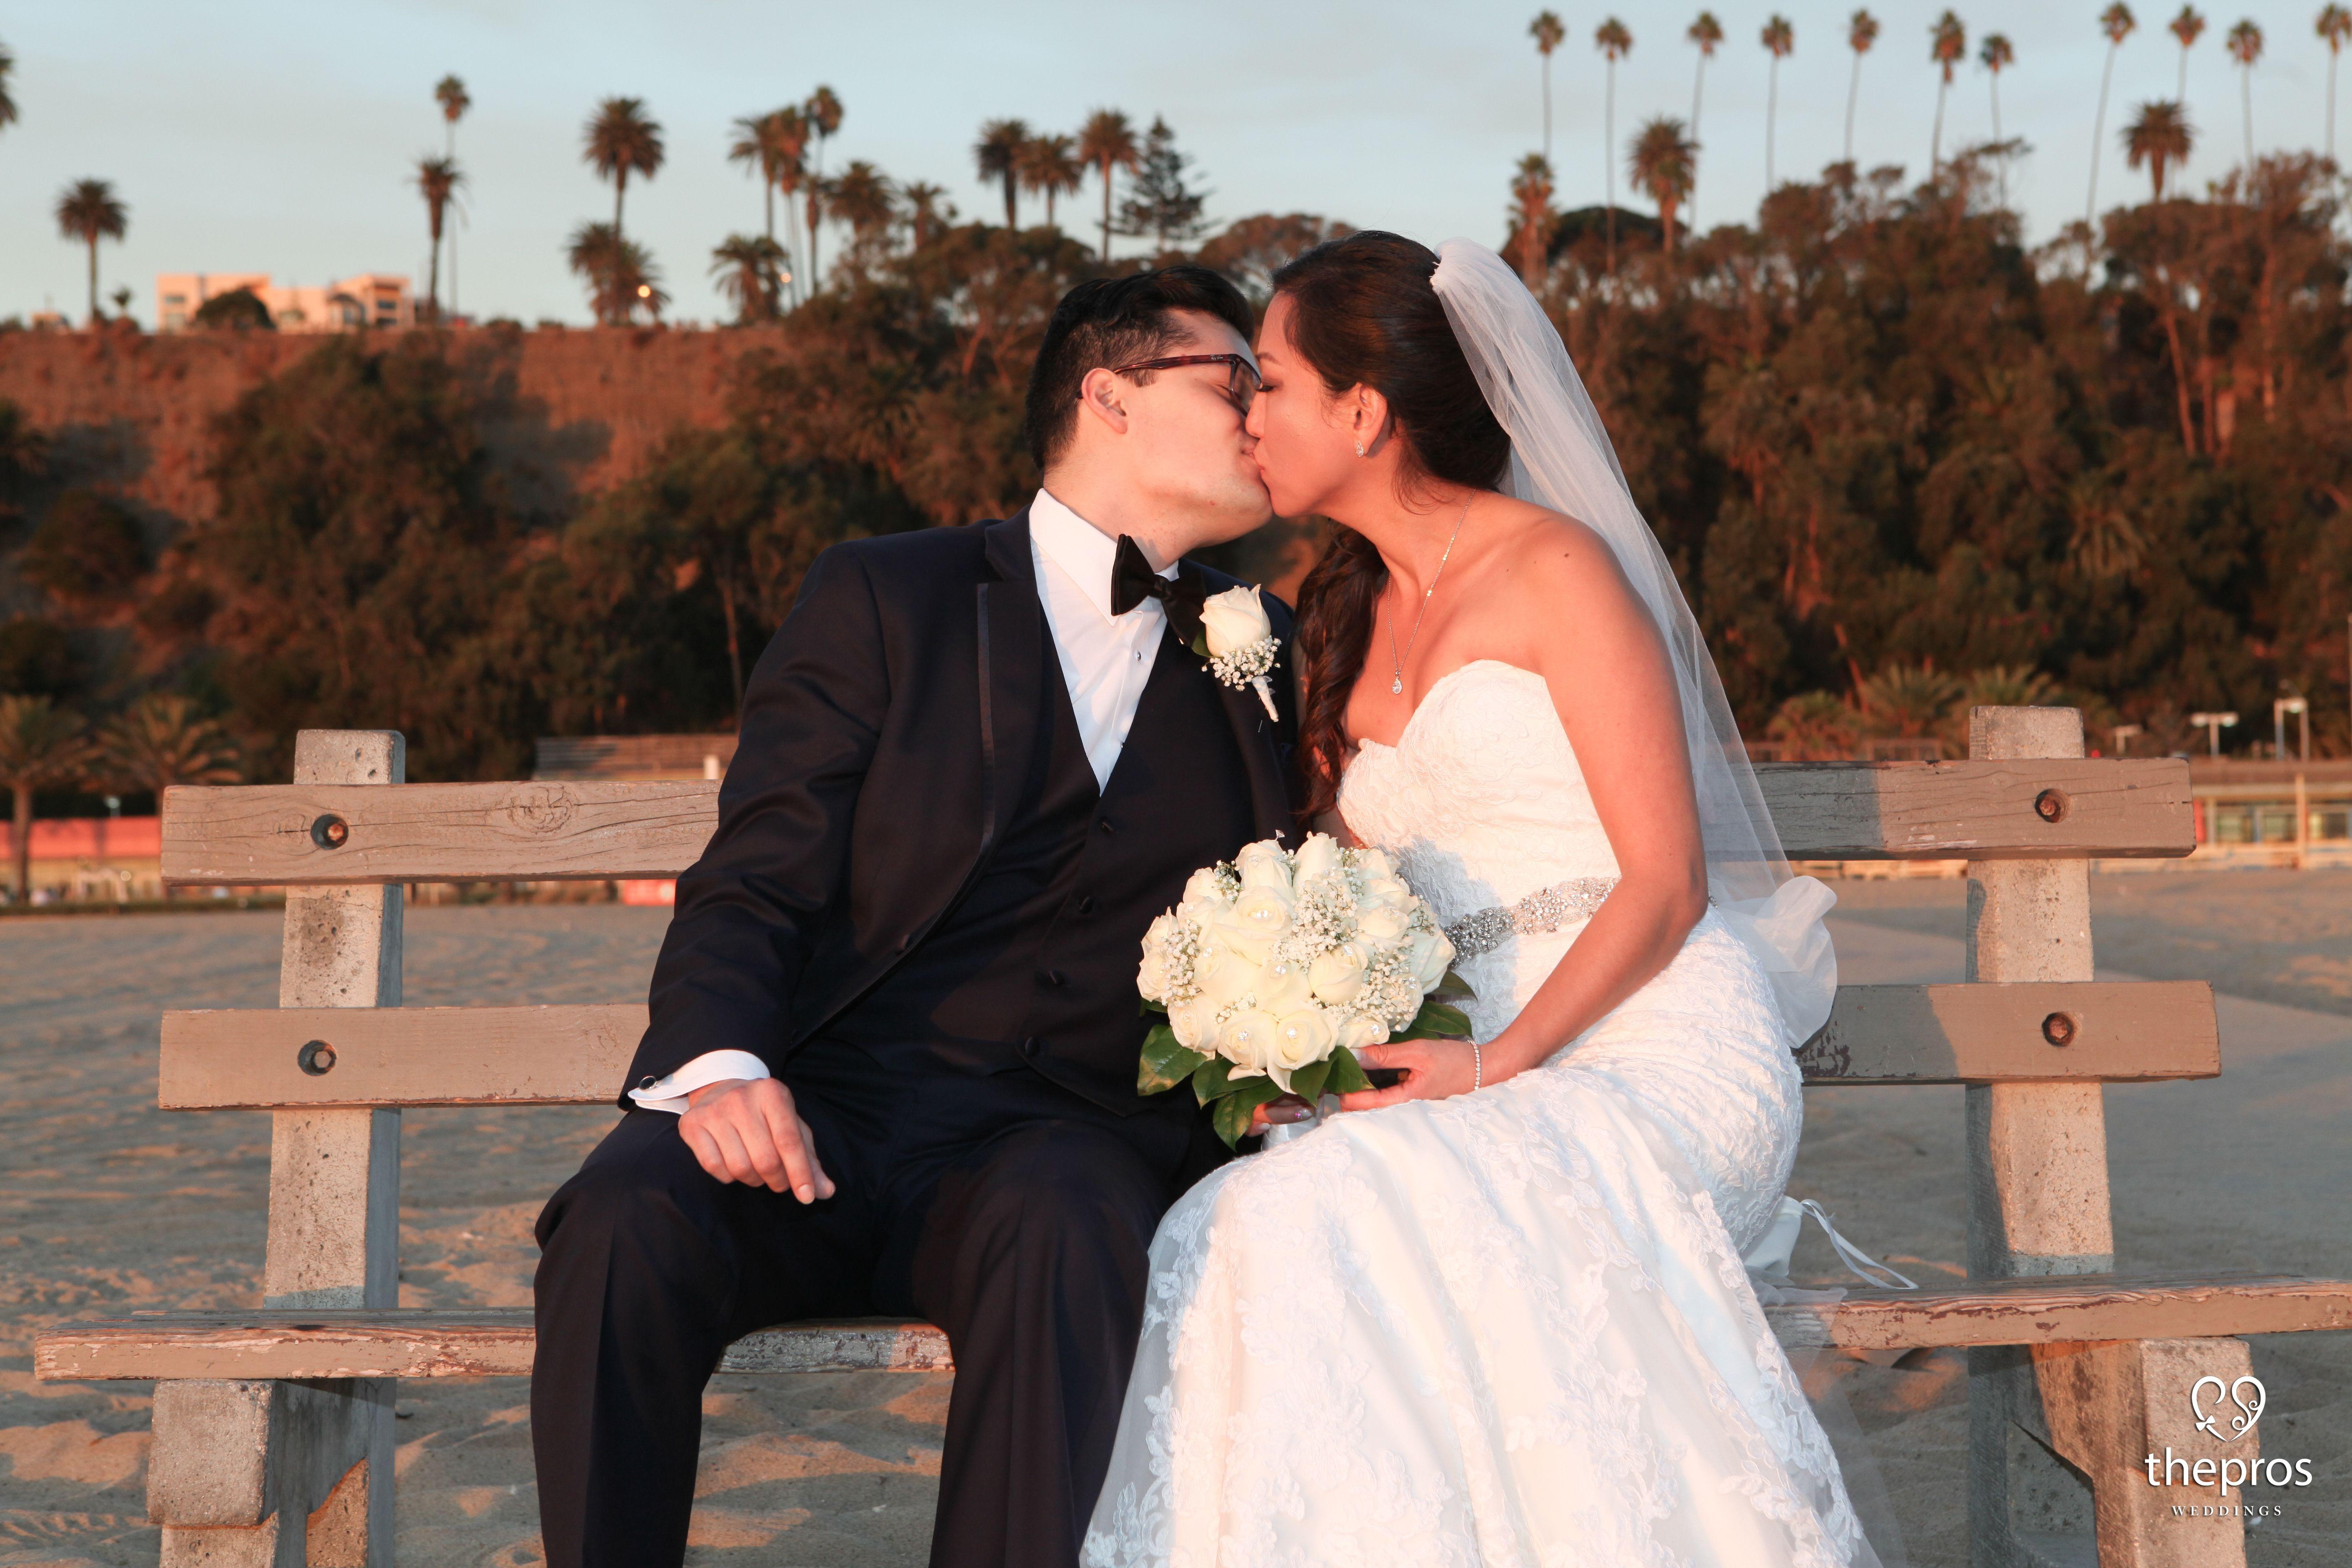 The Pros Weddings California Wedding Wedding Specials Real Weddings